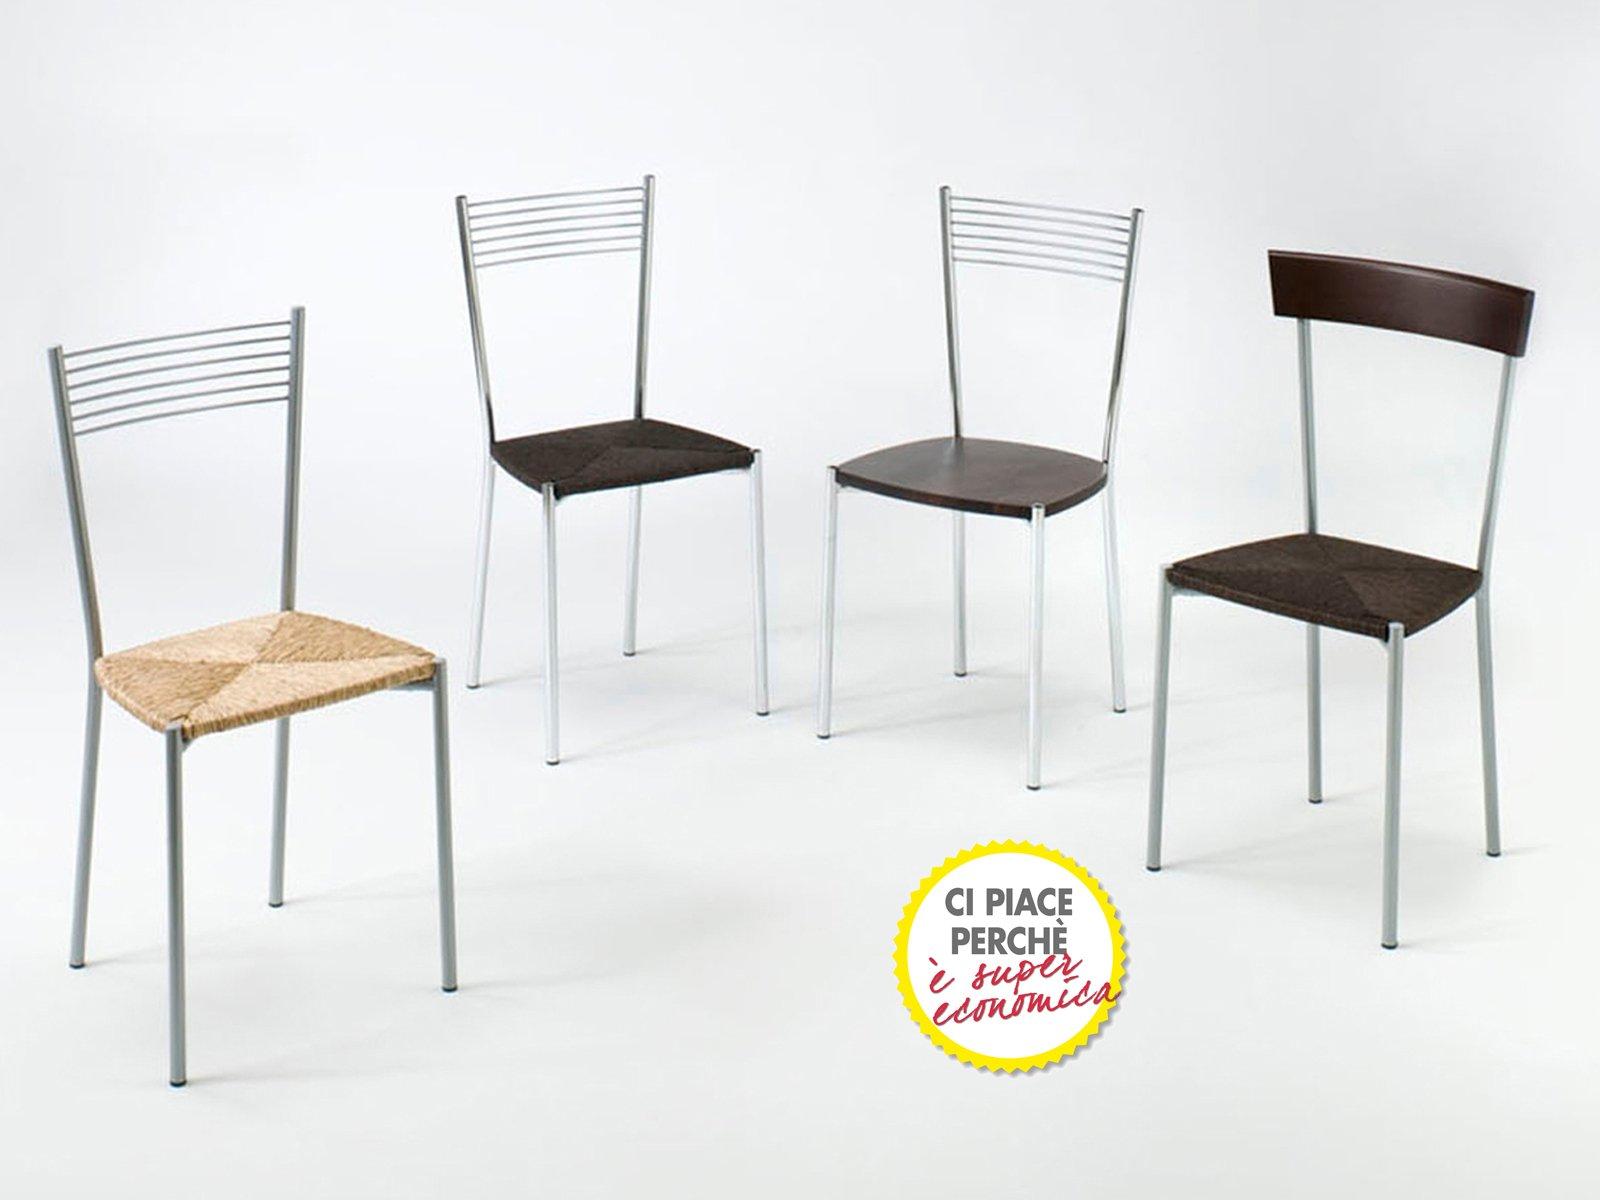 Sedie low cost 15 modelli a meno di 100 euro cose di casa - Sedie di legno per cucina ...